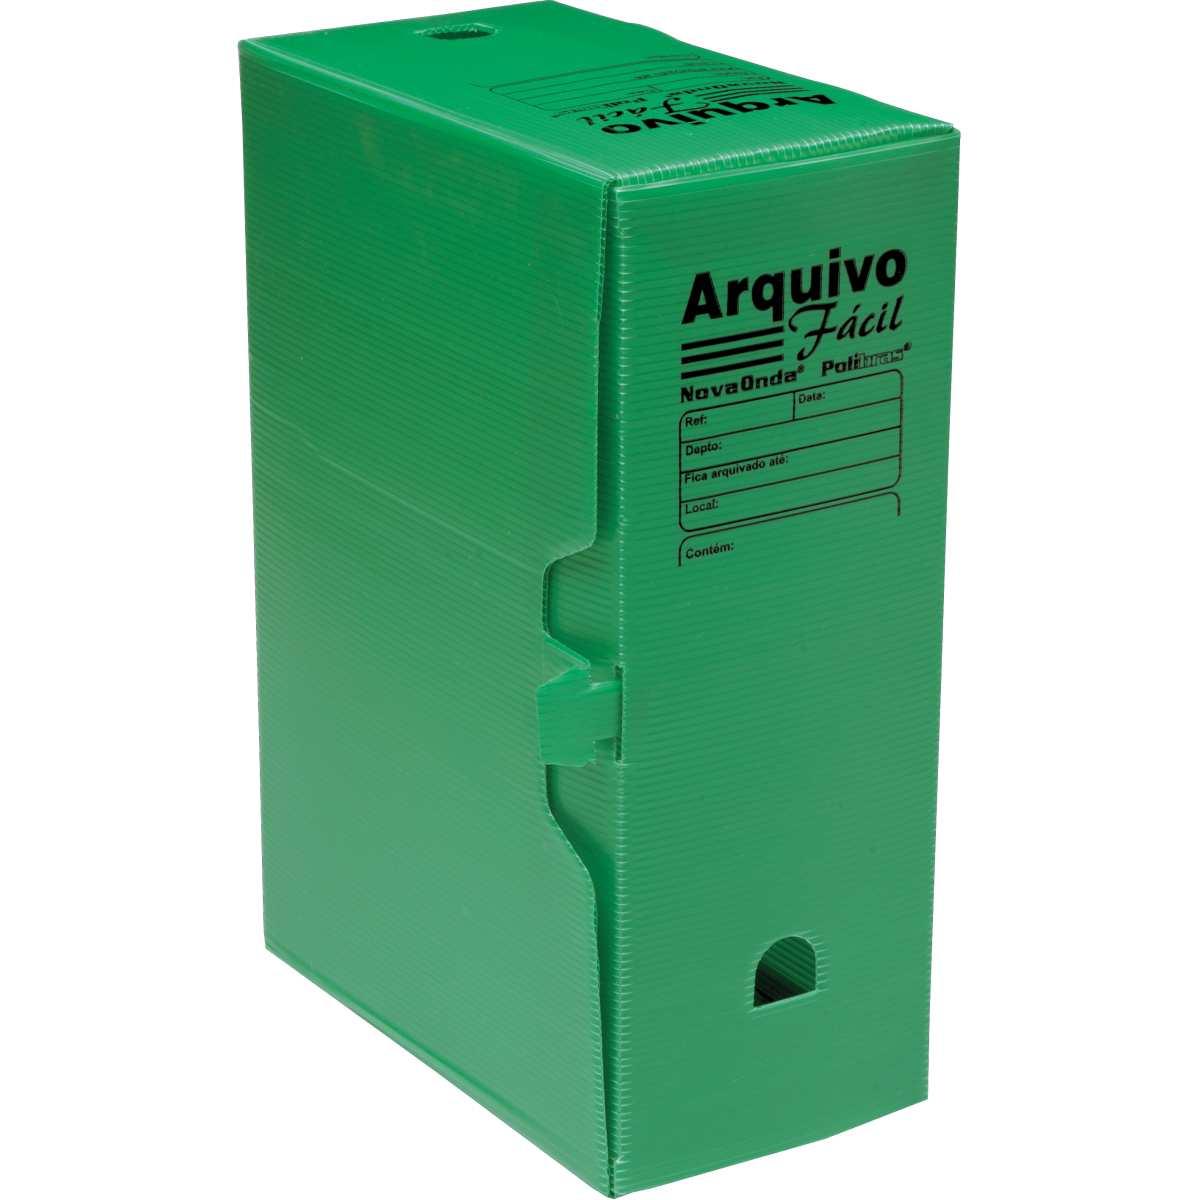 ARQUIVO MORTO PLASTICO VERDE 335 X 133 X 252 MM